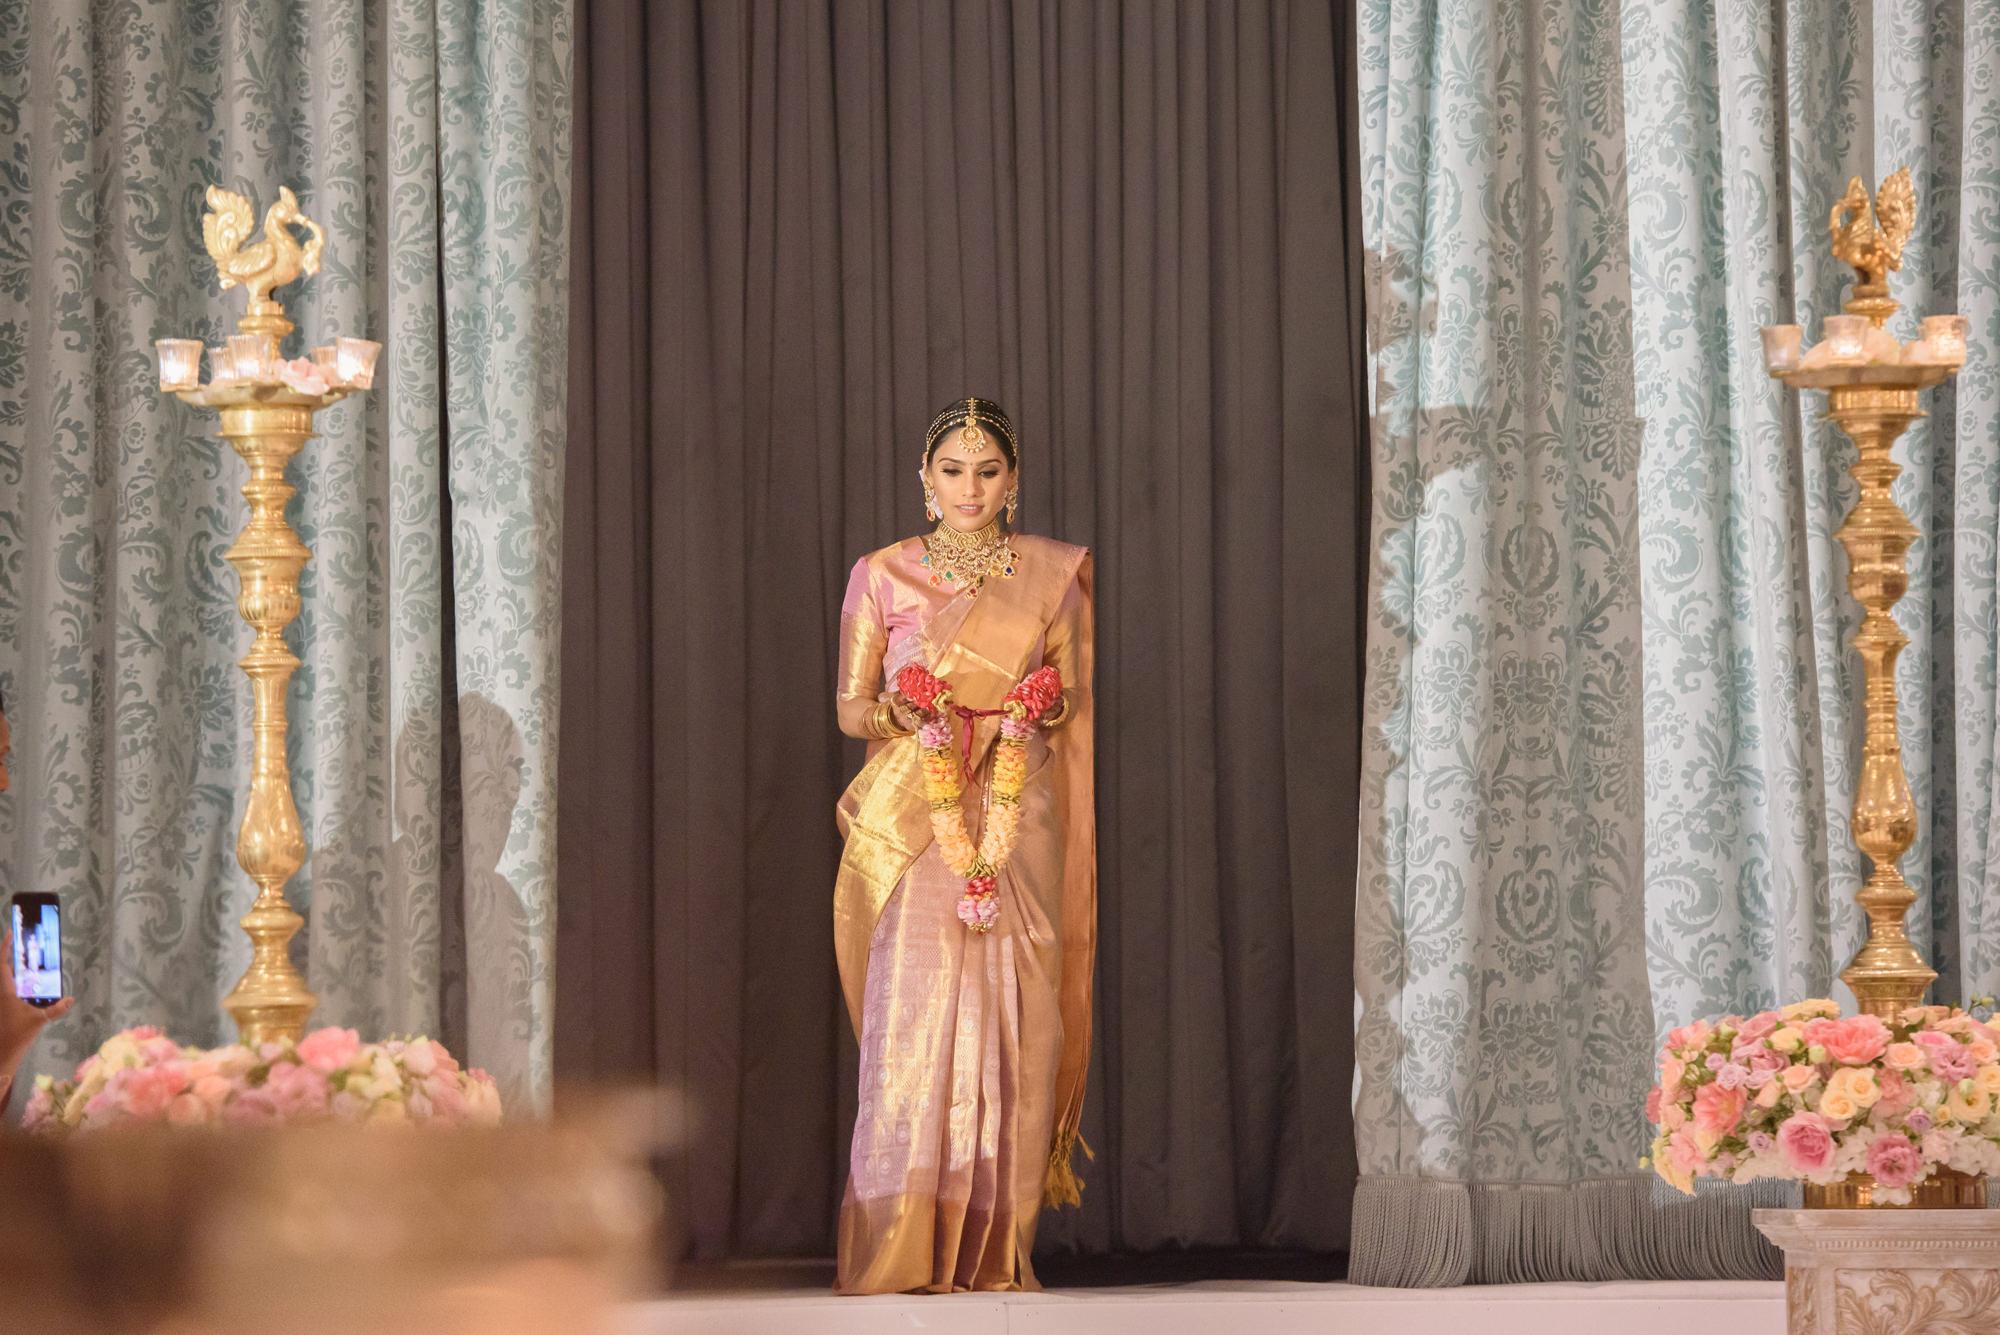 Tamil Gujrati hindu wedding photography photographer london the savoy -52.jpg